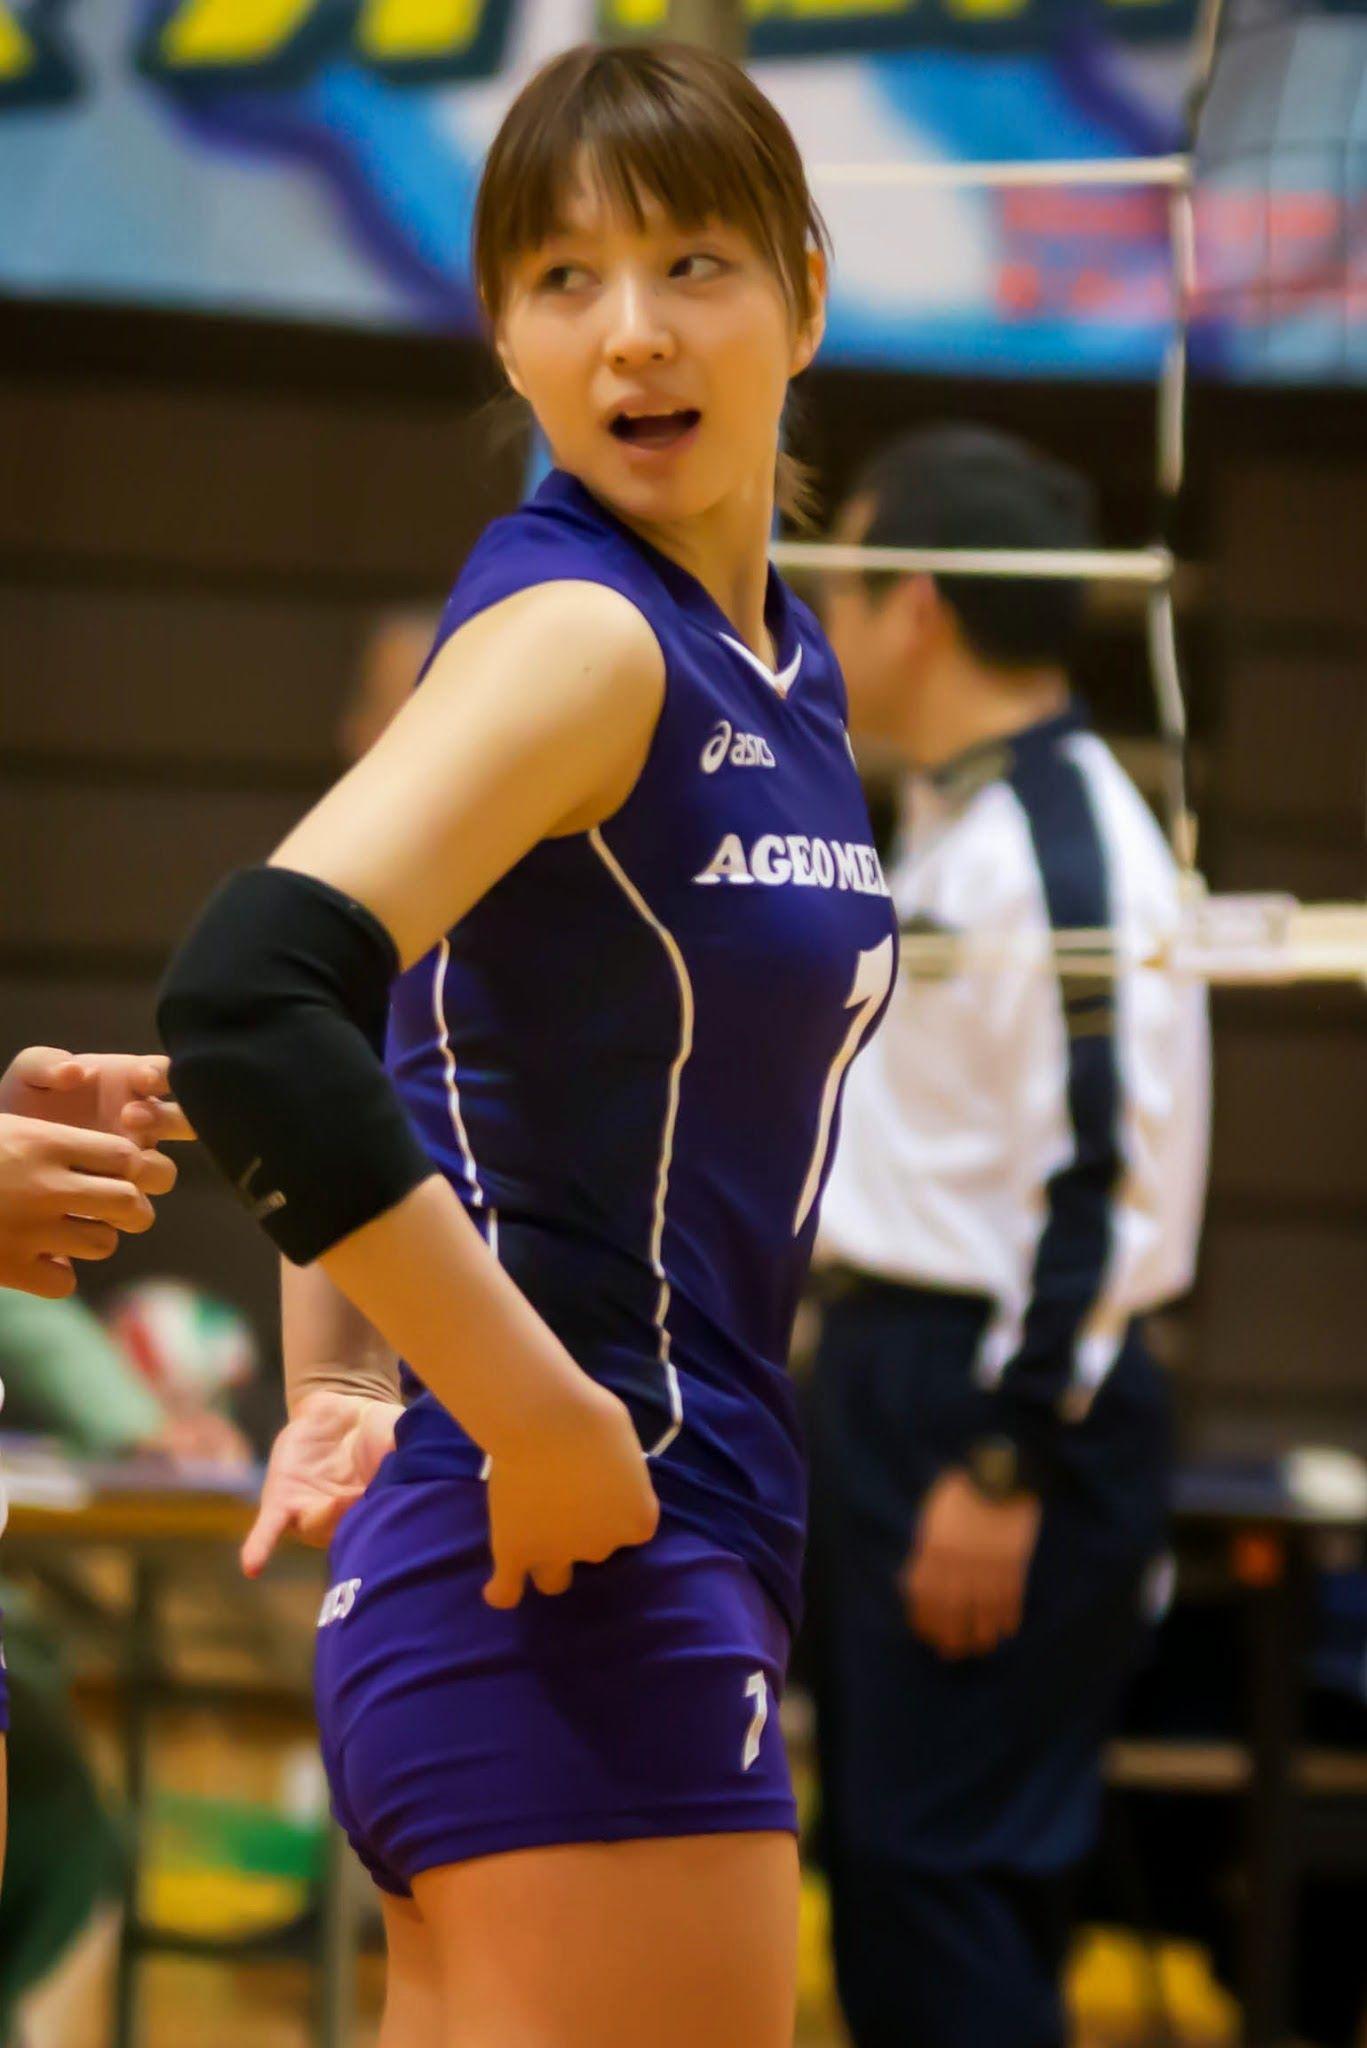 Pin By Amazong On Misc Female Athletes Female Volleyball Players Women Volleyball Female Athletes